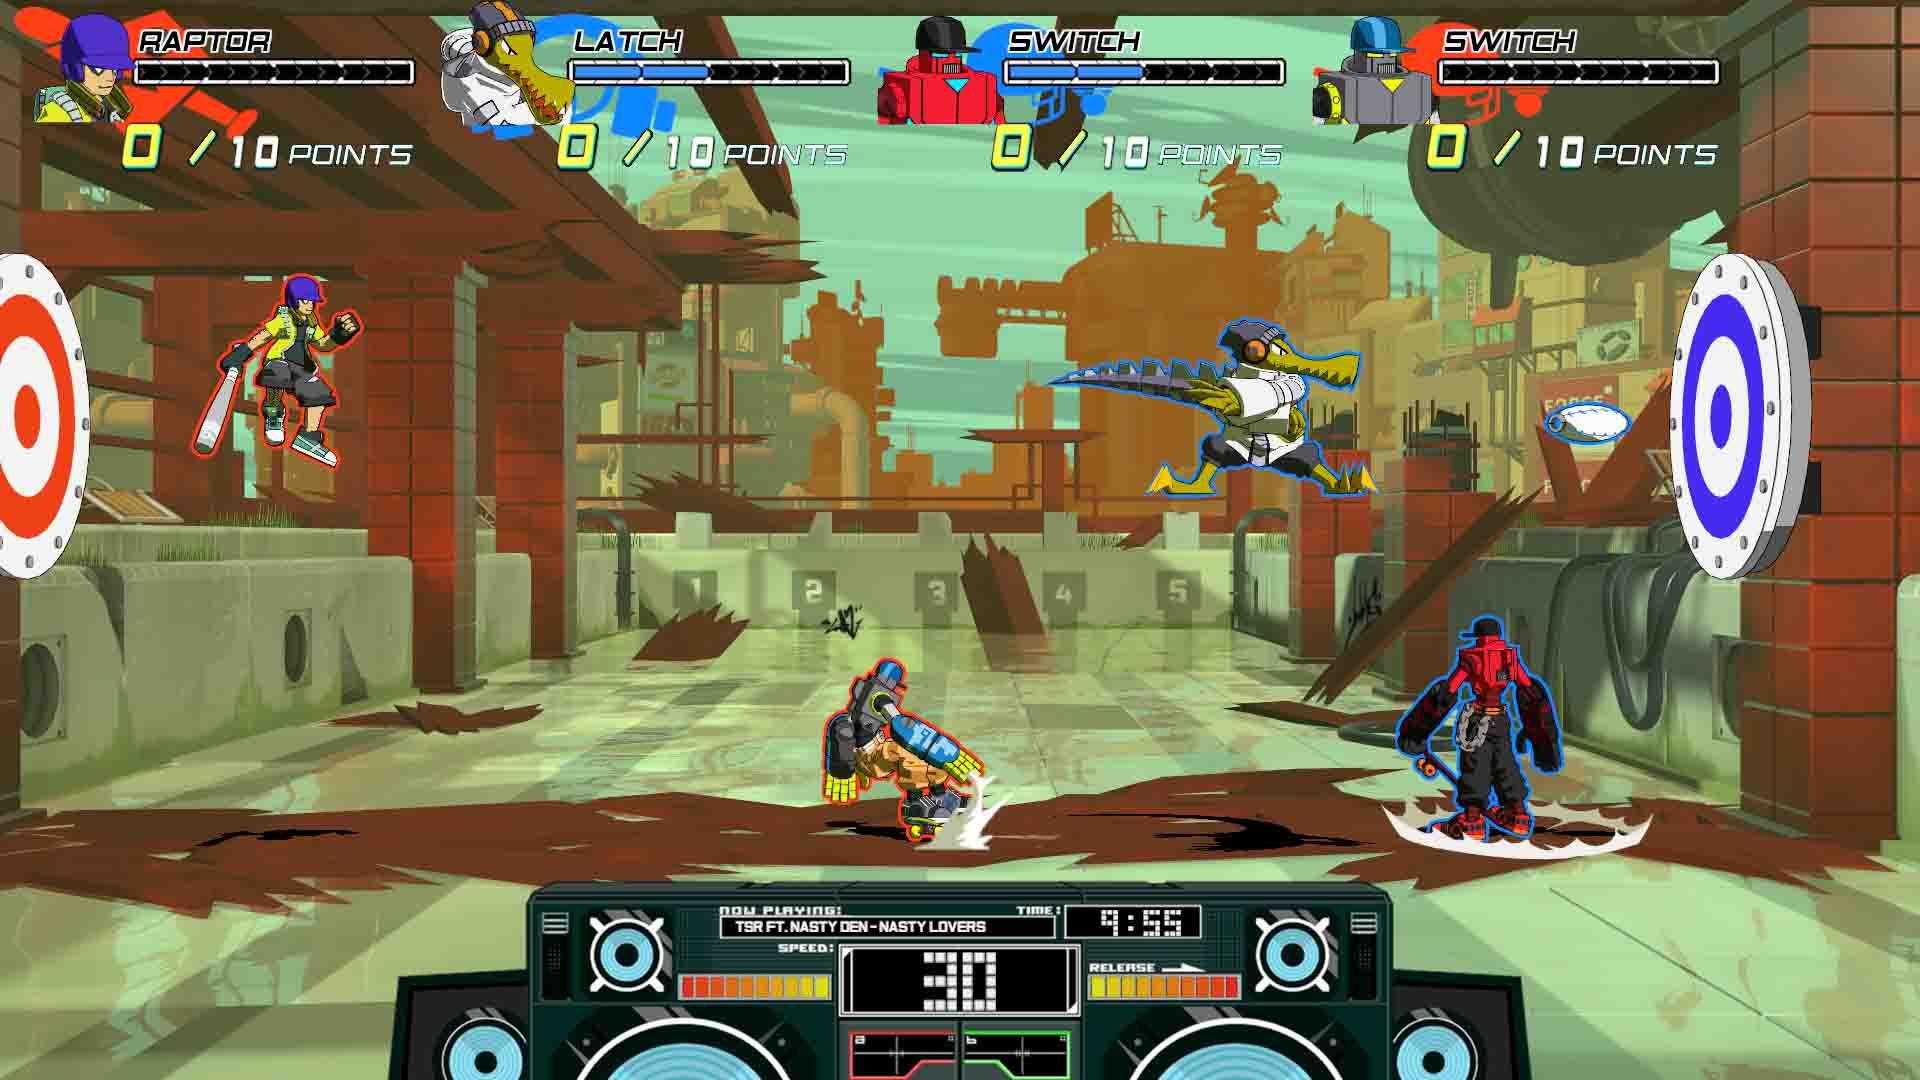 download-Lethal-League-Blaze-hadoan-tv-1